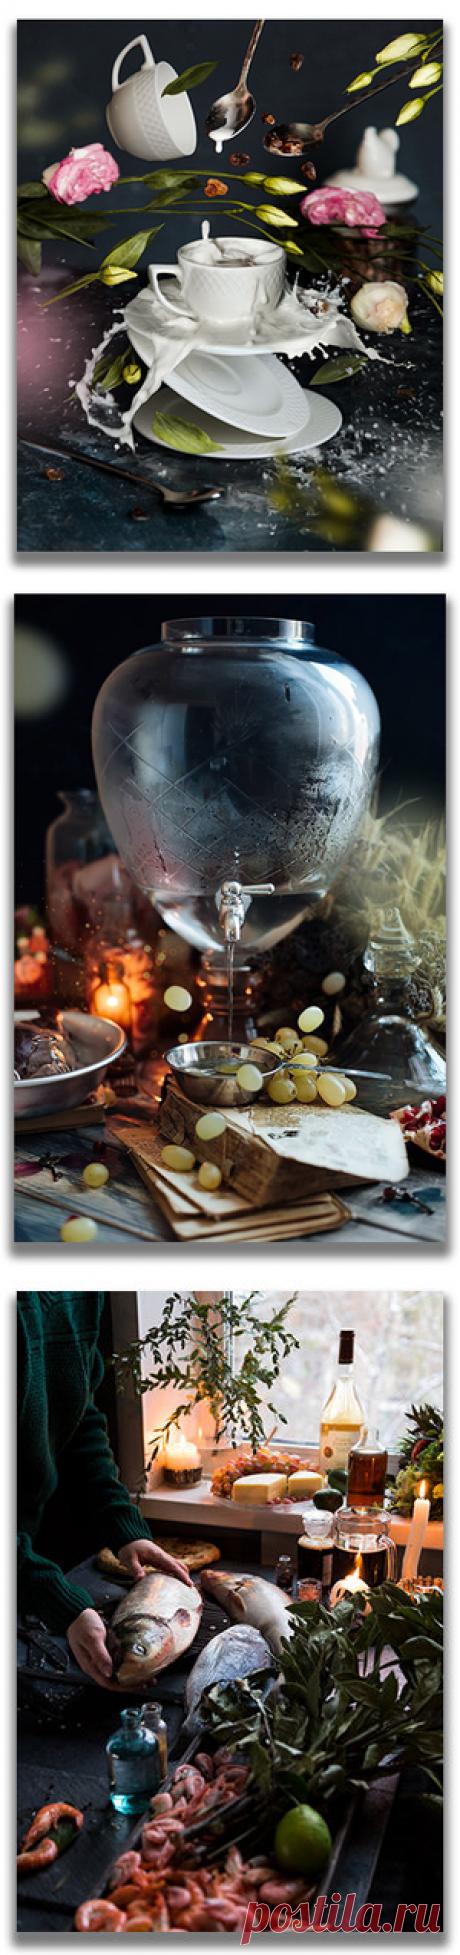 Juliacosmo — «Tea time, darling»